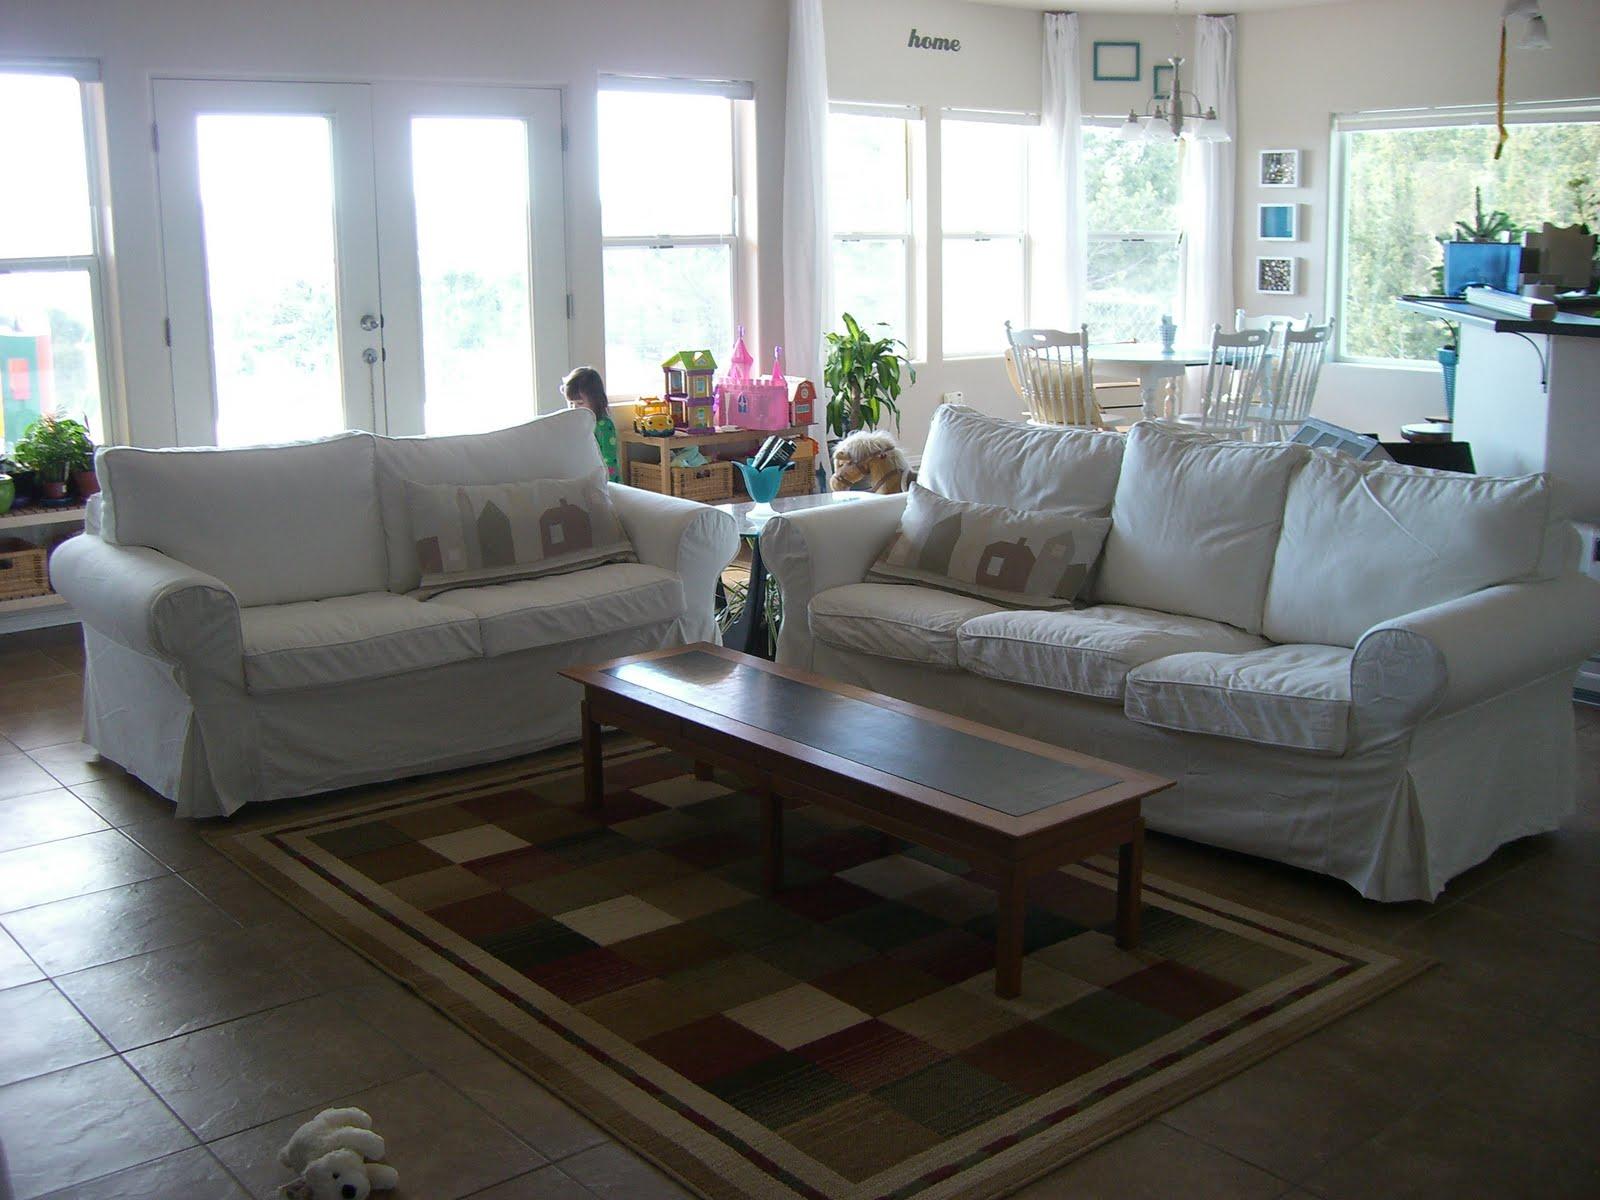 ikea ektorp sofas for living room ooo ahhh | the new living